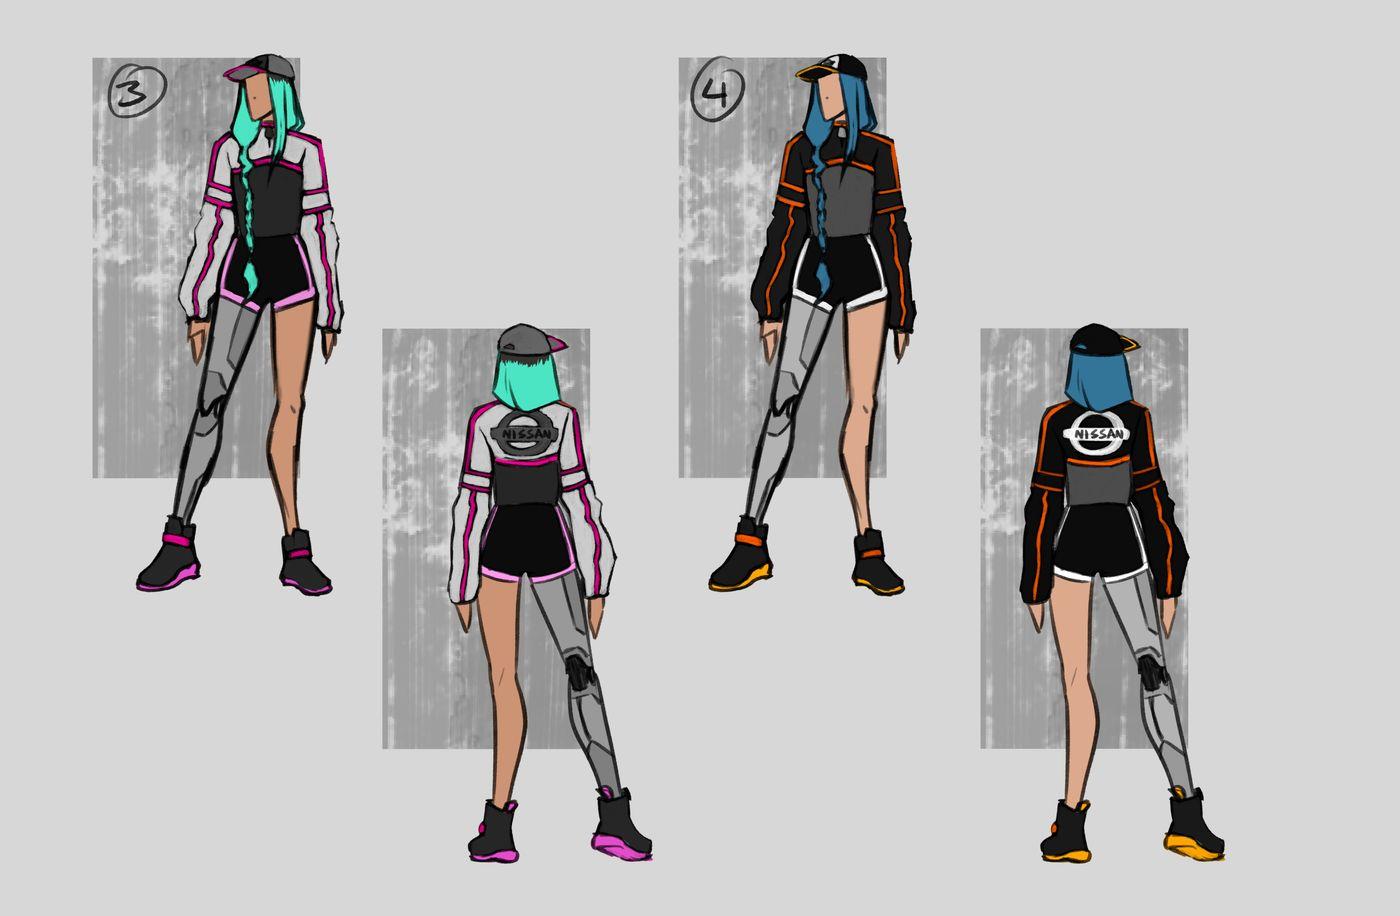 Steer Jasmine %20 Scme3420 Rookies %20 Character Design Colour Passes02 Jasminesteer